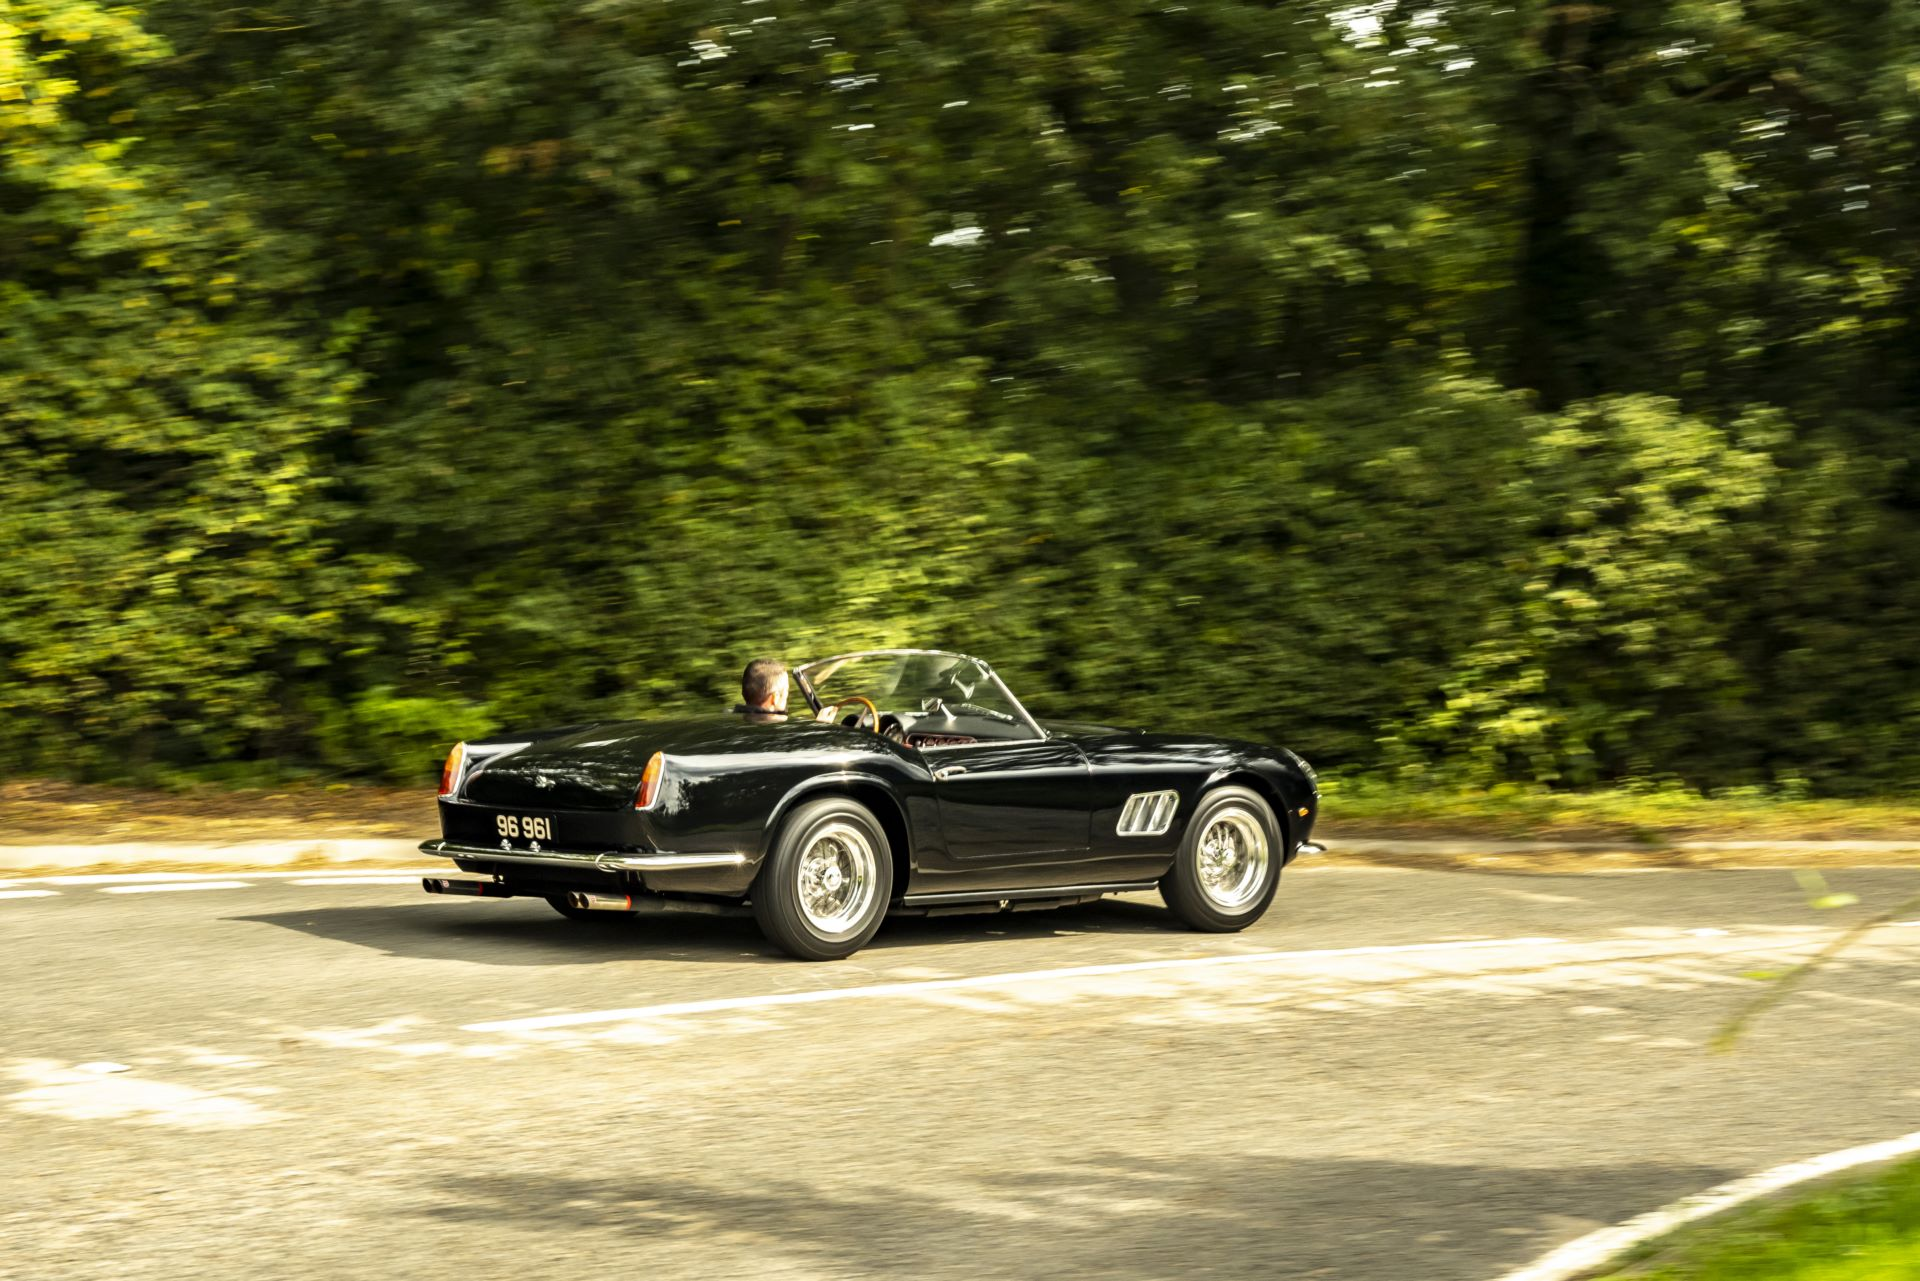 Ferrari-California-Spyder-by-GTO-Engineering-4